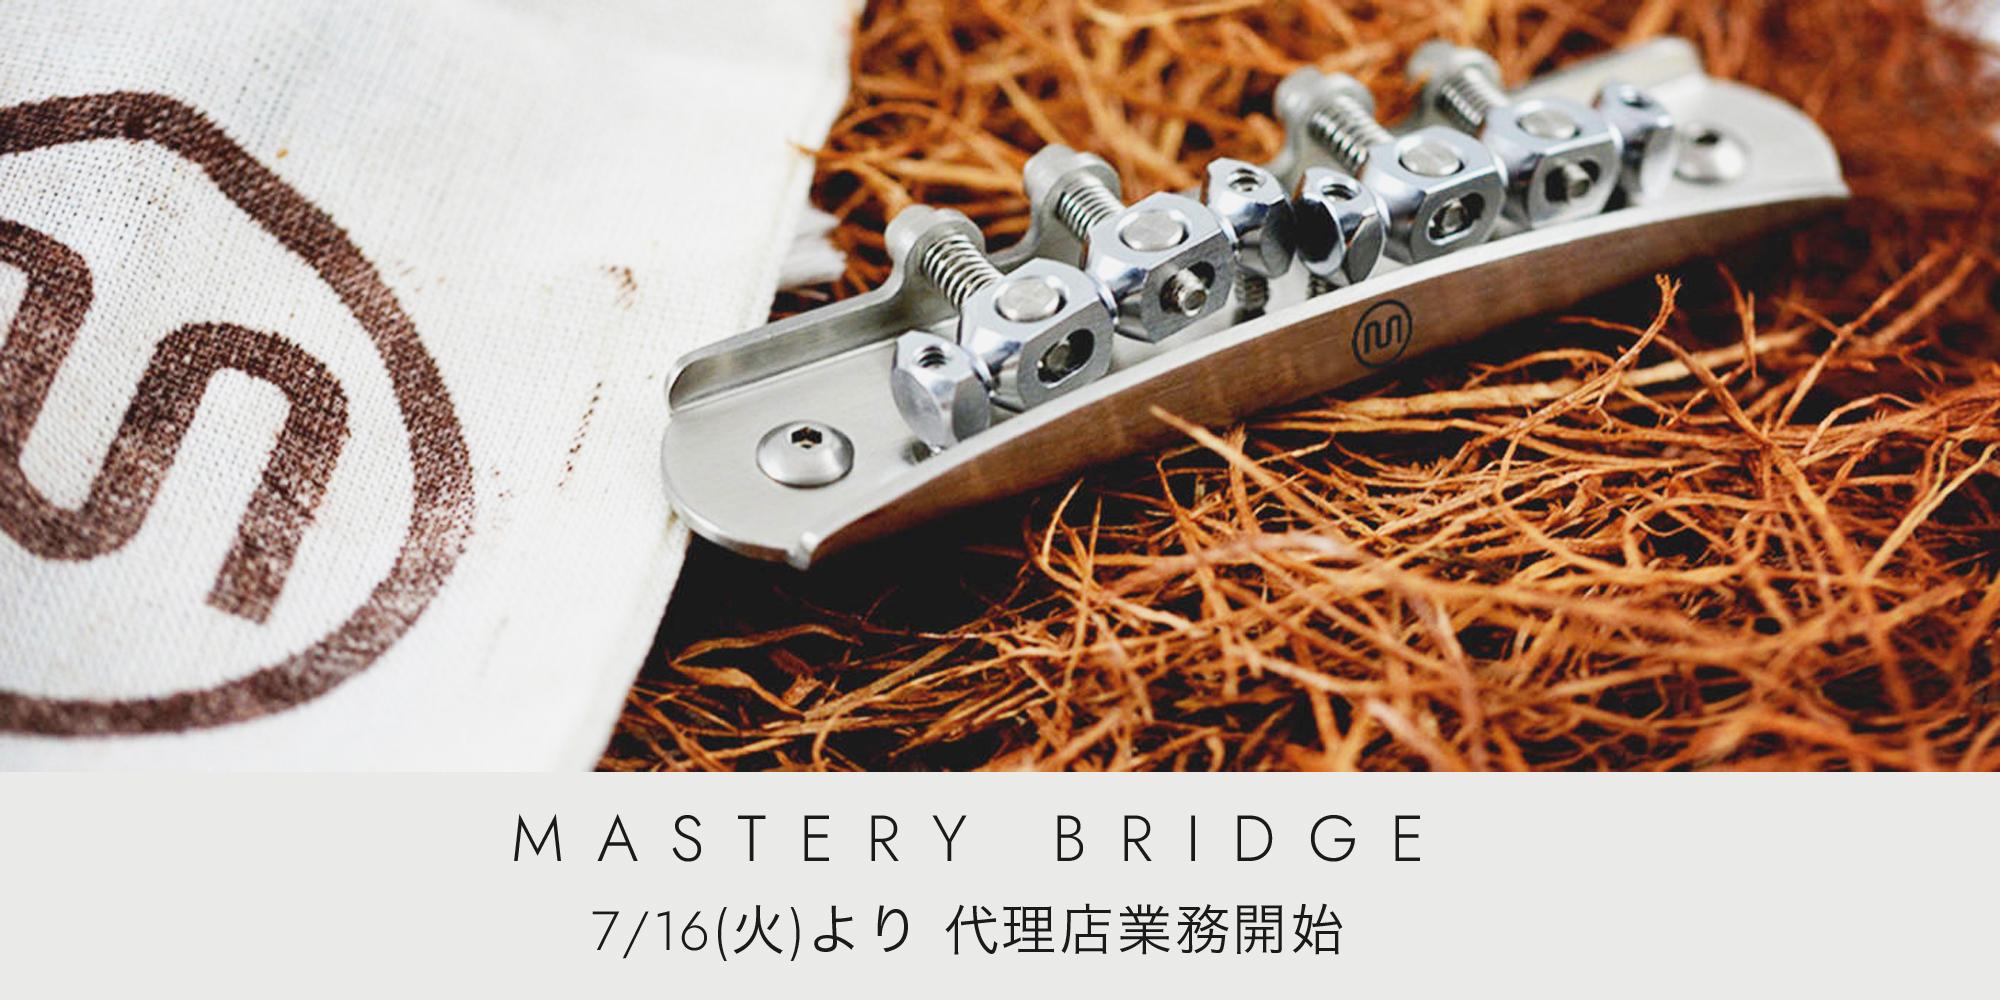 Mastery Bridge 輸入代理店業務開始のご案内